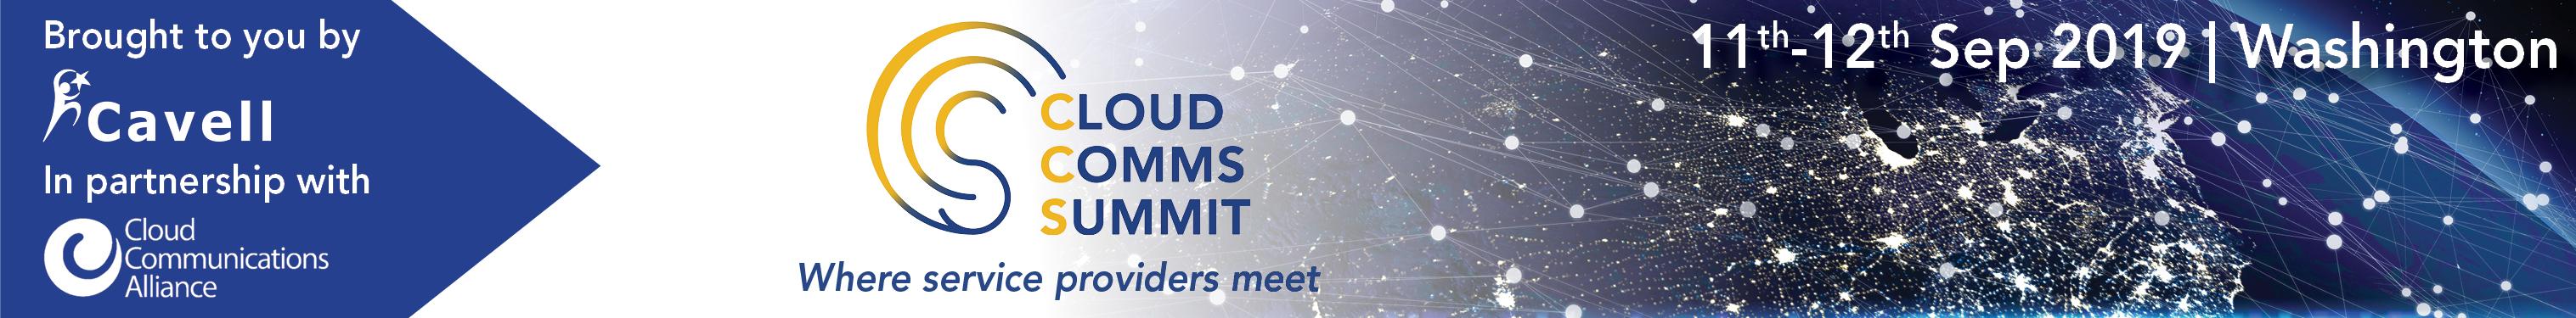 Cloud Comms Summit in Washington